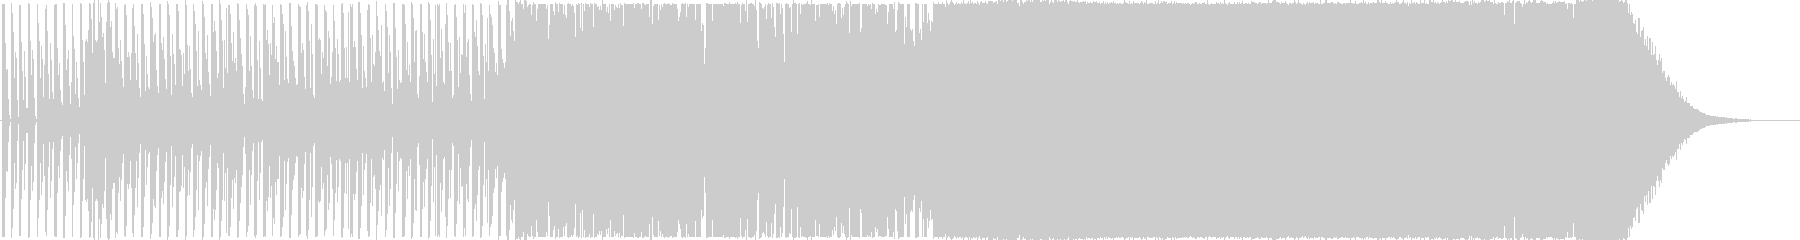 EDM風のラベルのボレロの未再生の波形